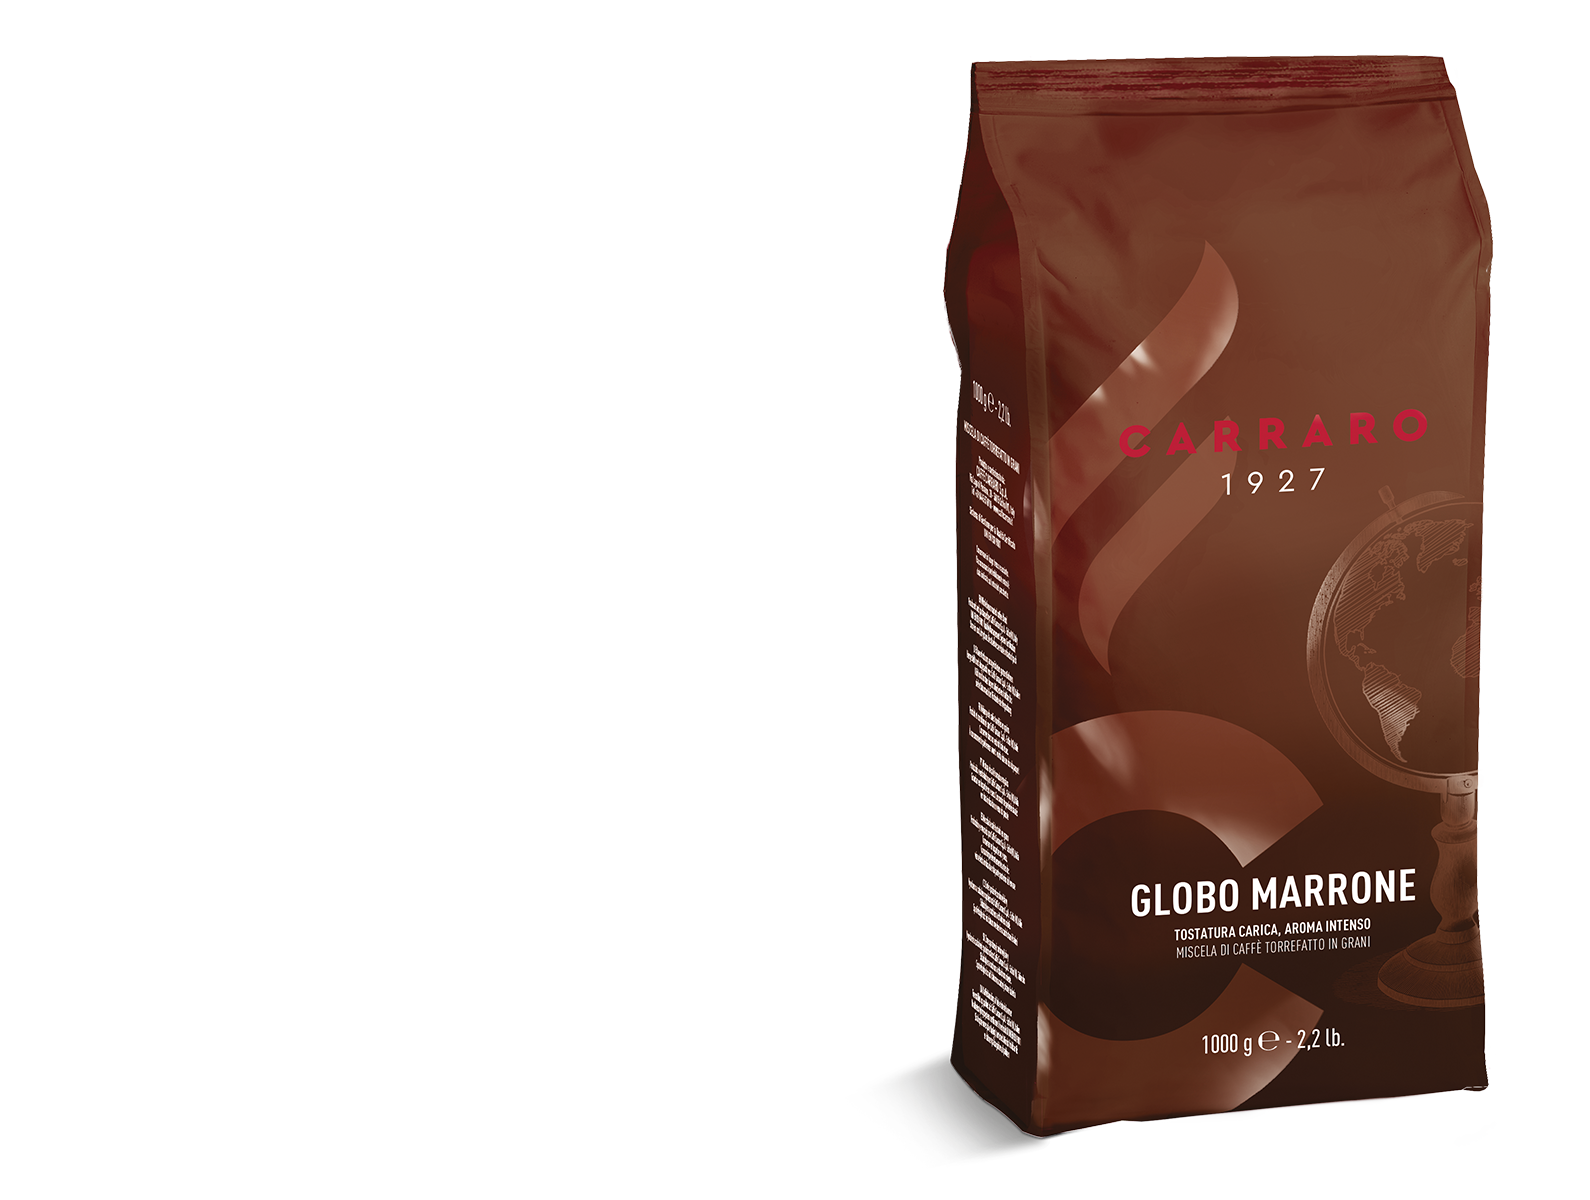 Globo Marrone – coffee beans 1000 g